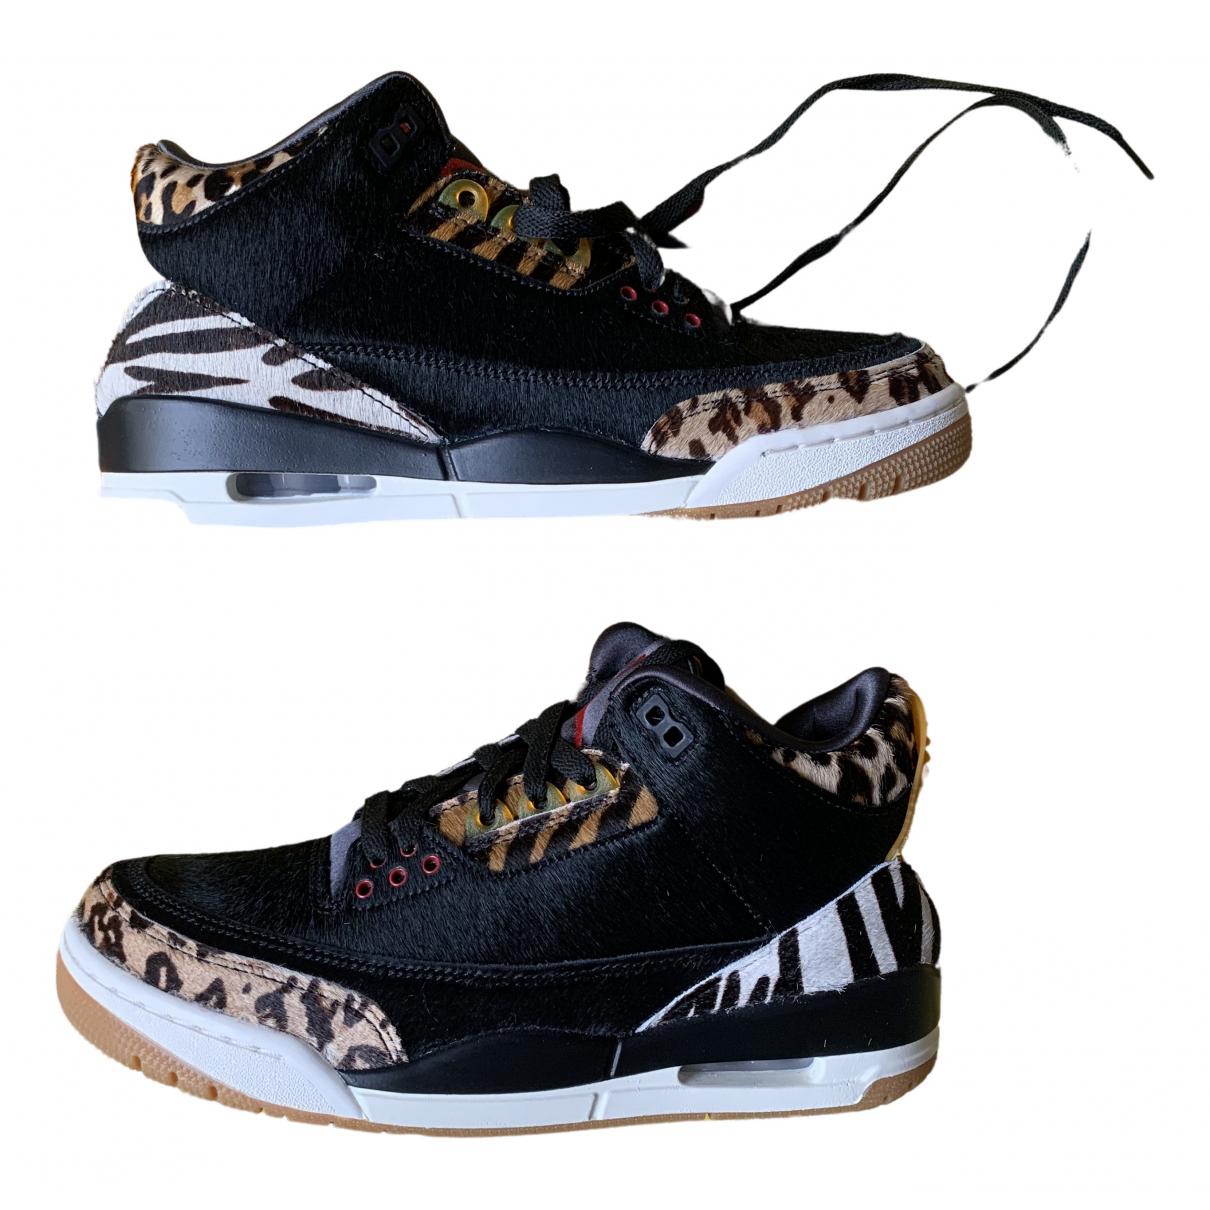 Jordan Air Jordan 3 Sneakers in  Schwarz Synthetikpelz